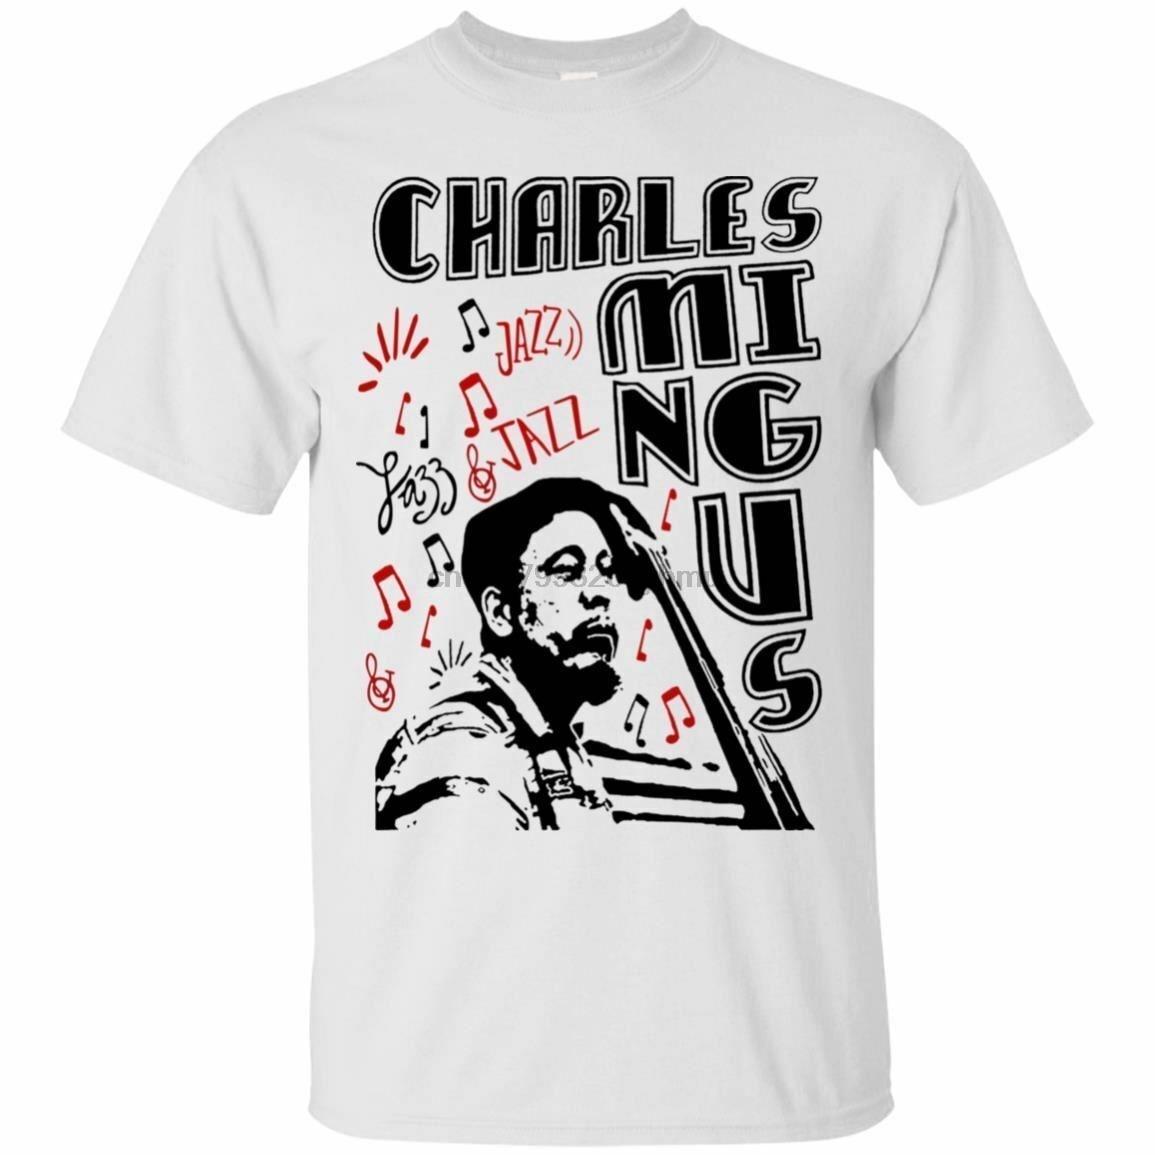 Saxophone T-Shirt Mens S-5XL musician jazz players lovers gift present idea